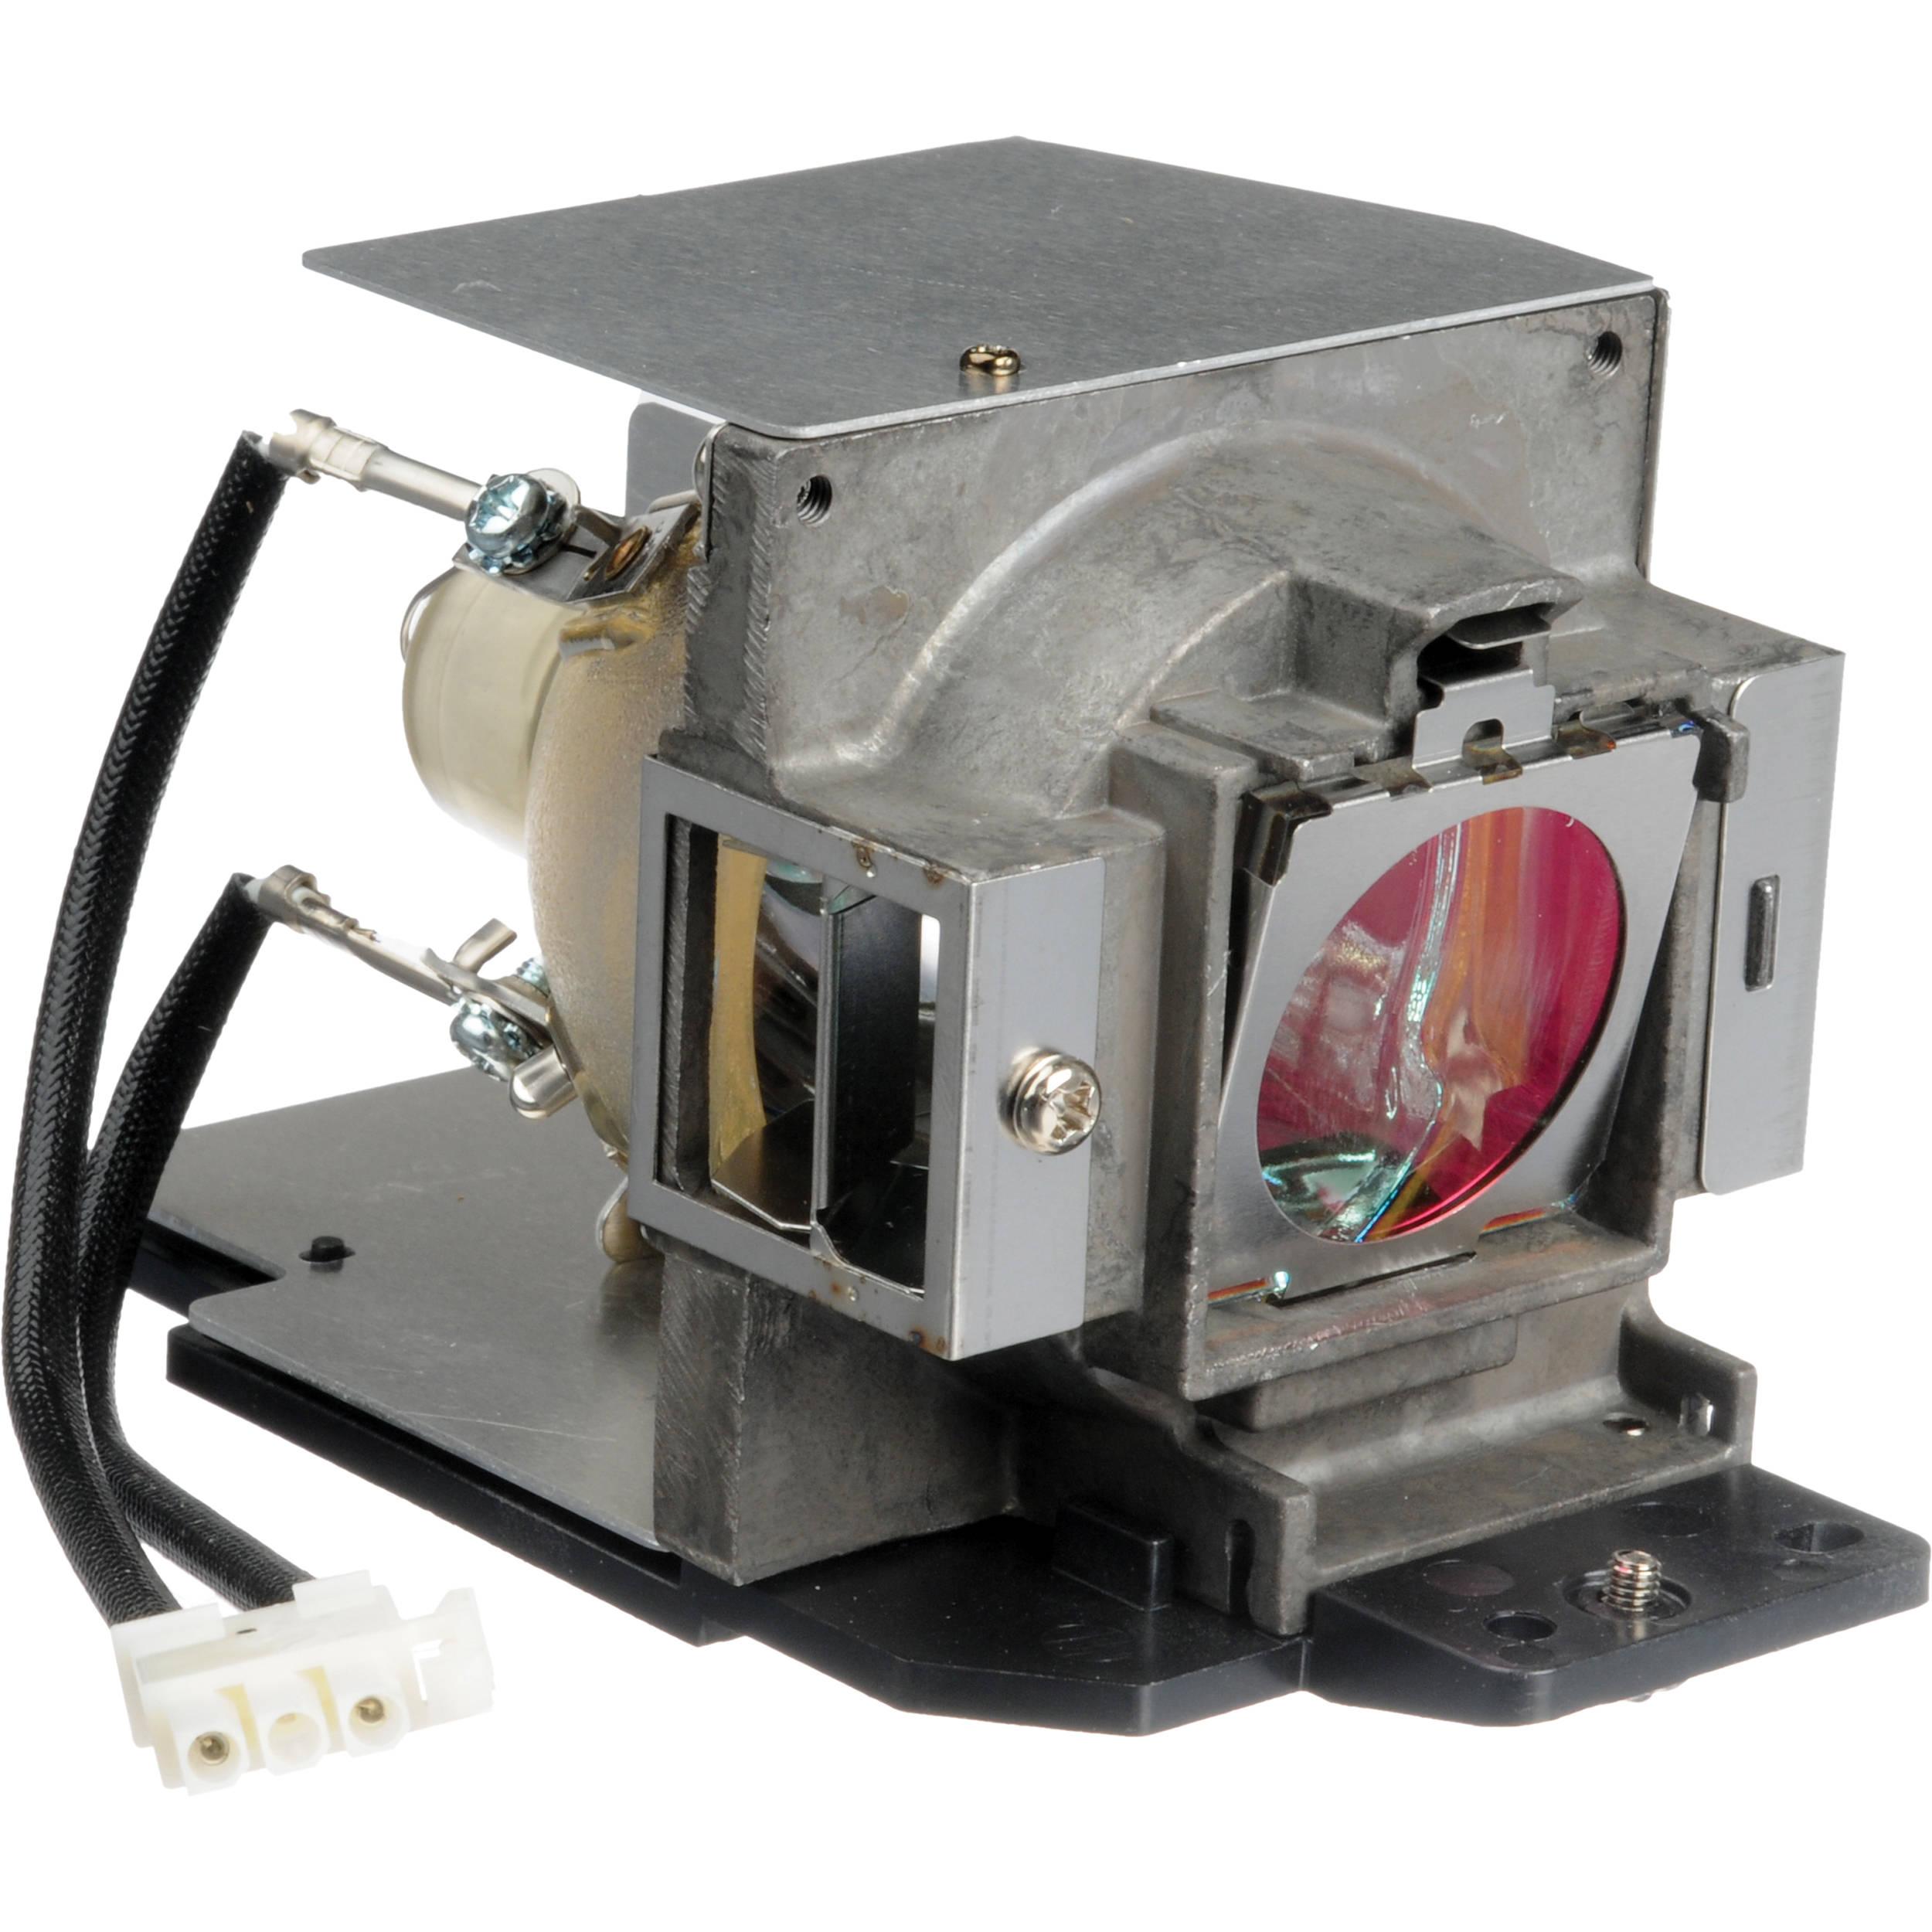 BenQ 5J.J0405.001 Replacement Lamp for MP776 ST 5J.J0405.001 B&H